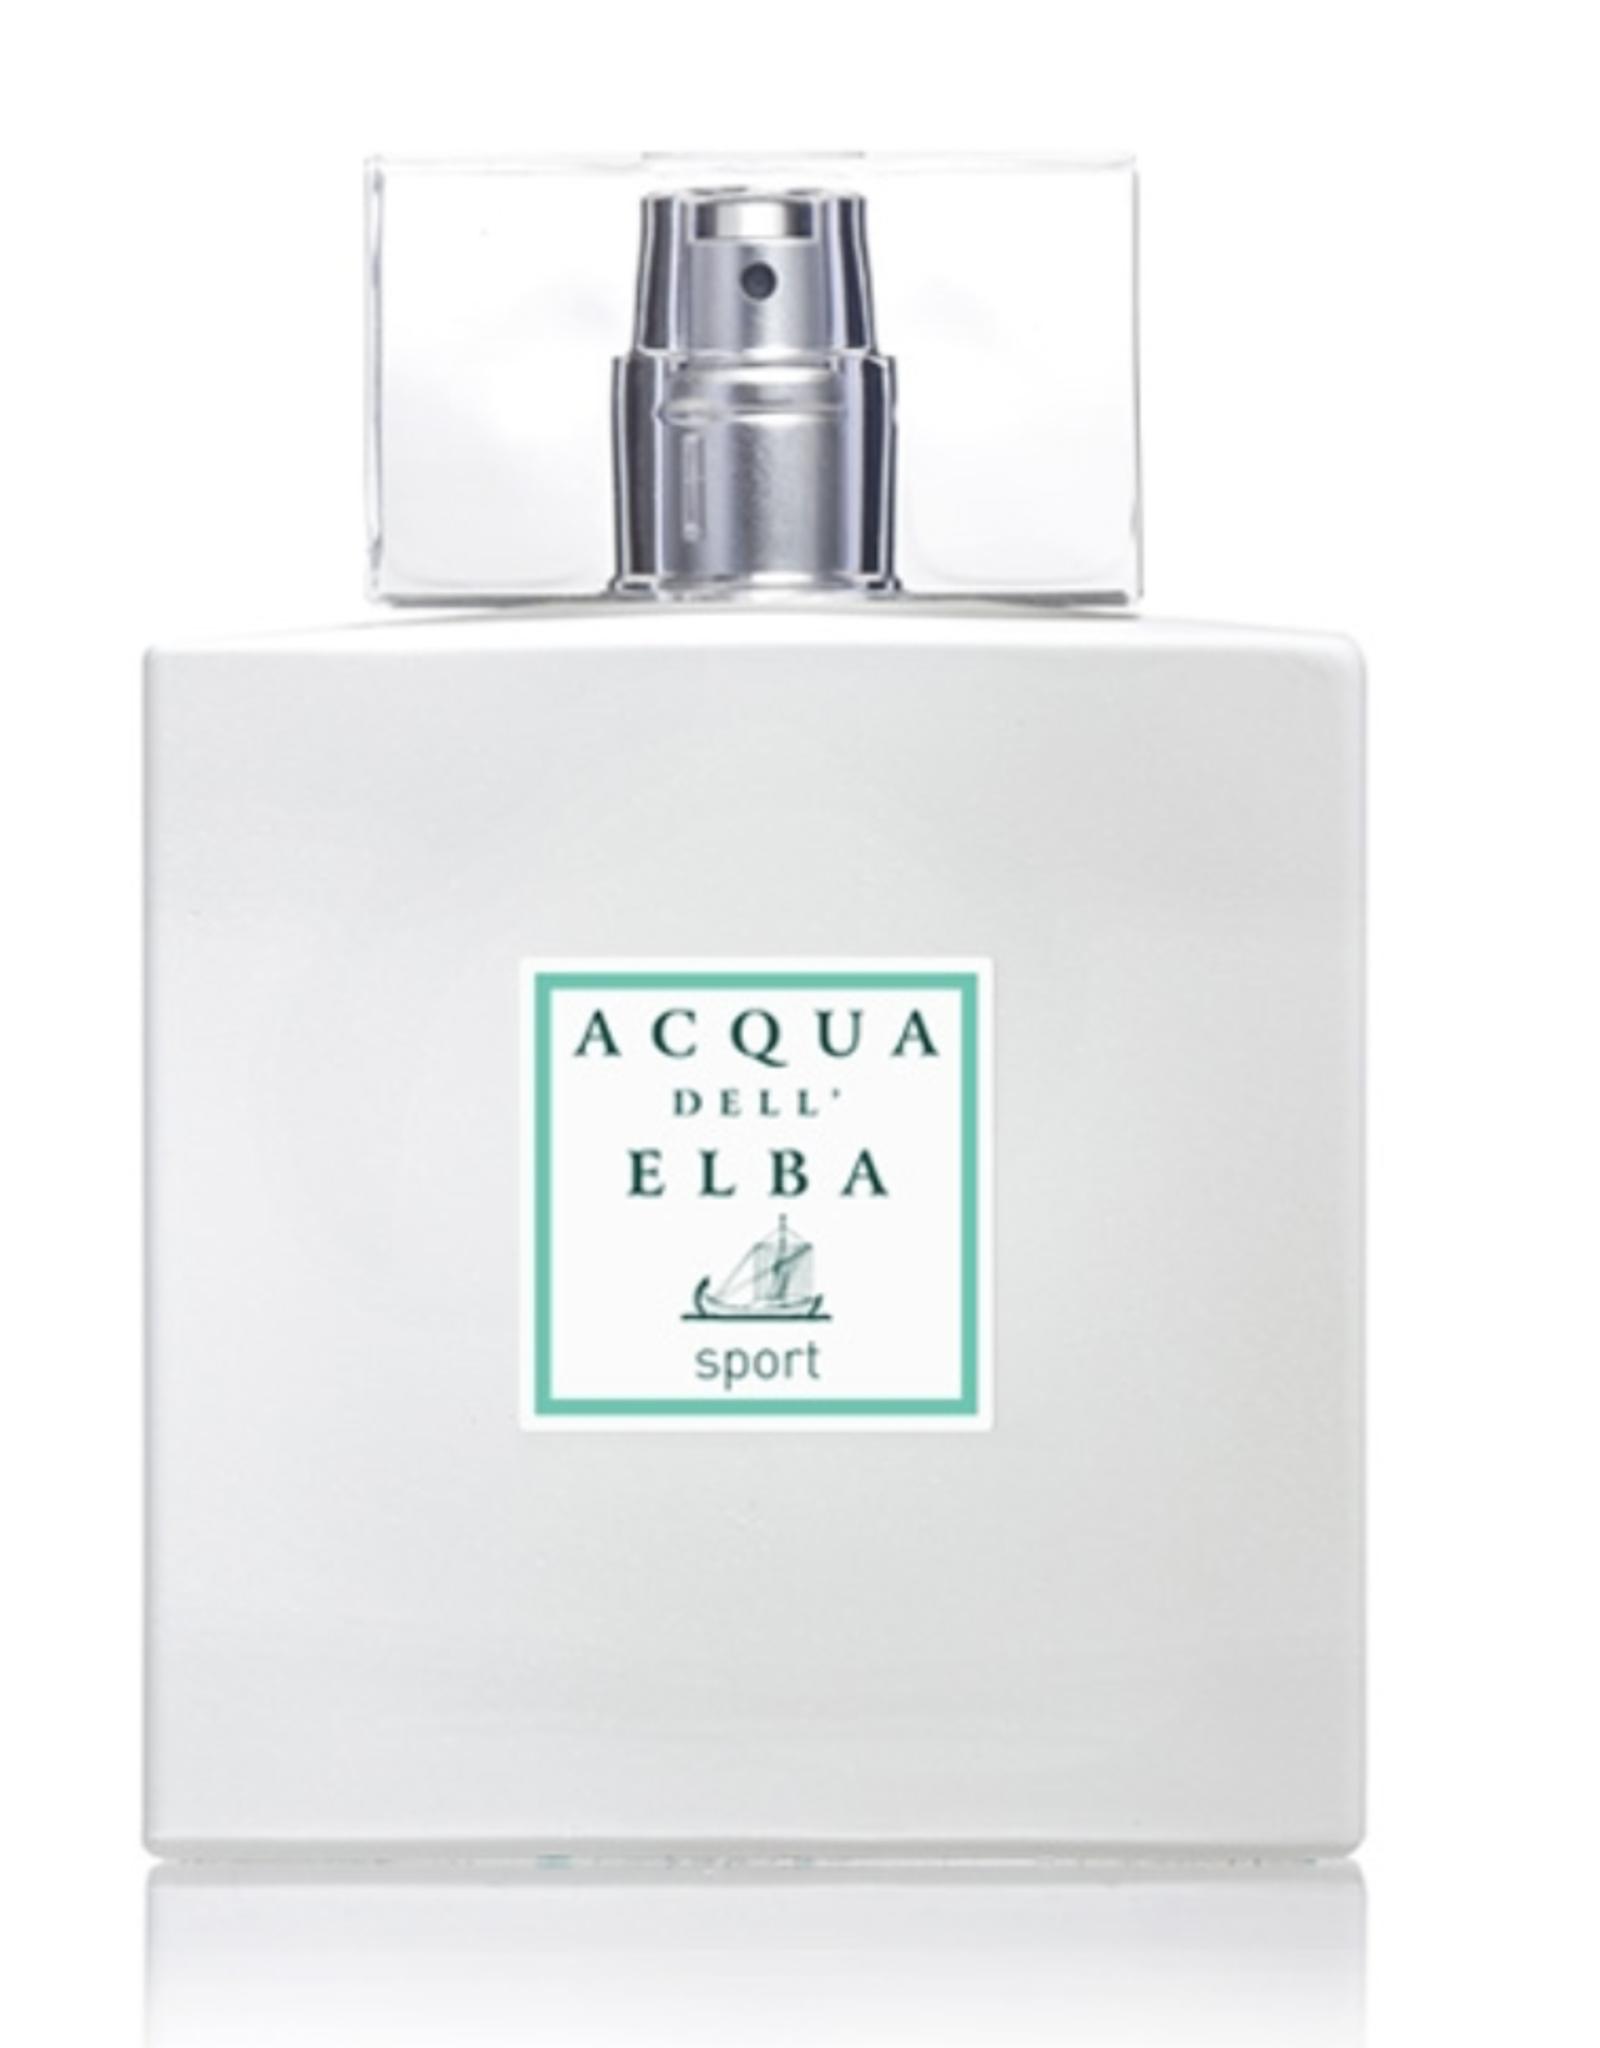 Acqua Dell Elba Acqua Dell' Elba Sport Eau de Parfum 50ML